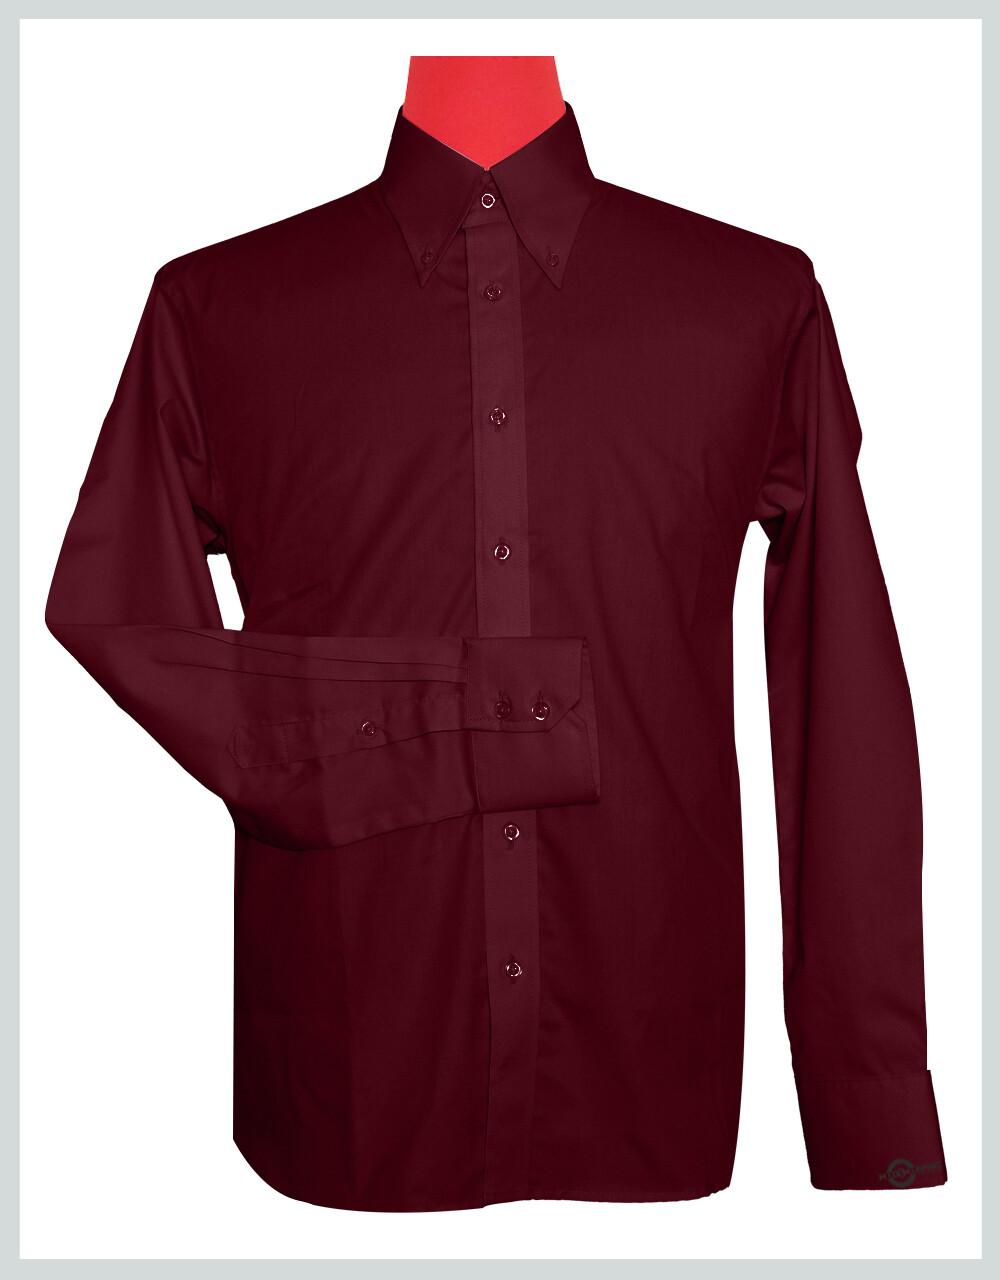 Button-Down Collar Shirt | Burgundy Color Shirt For Man